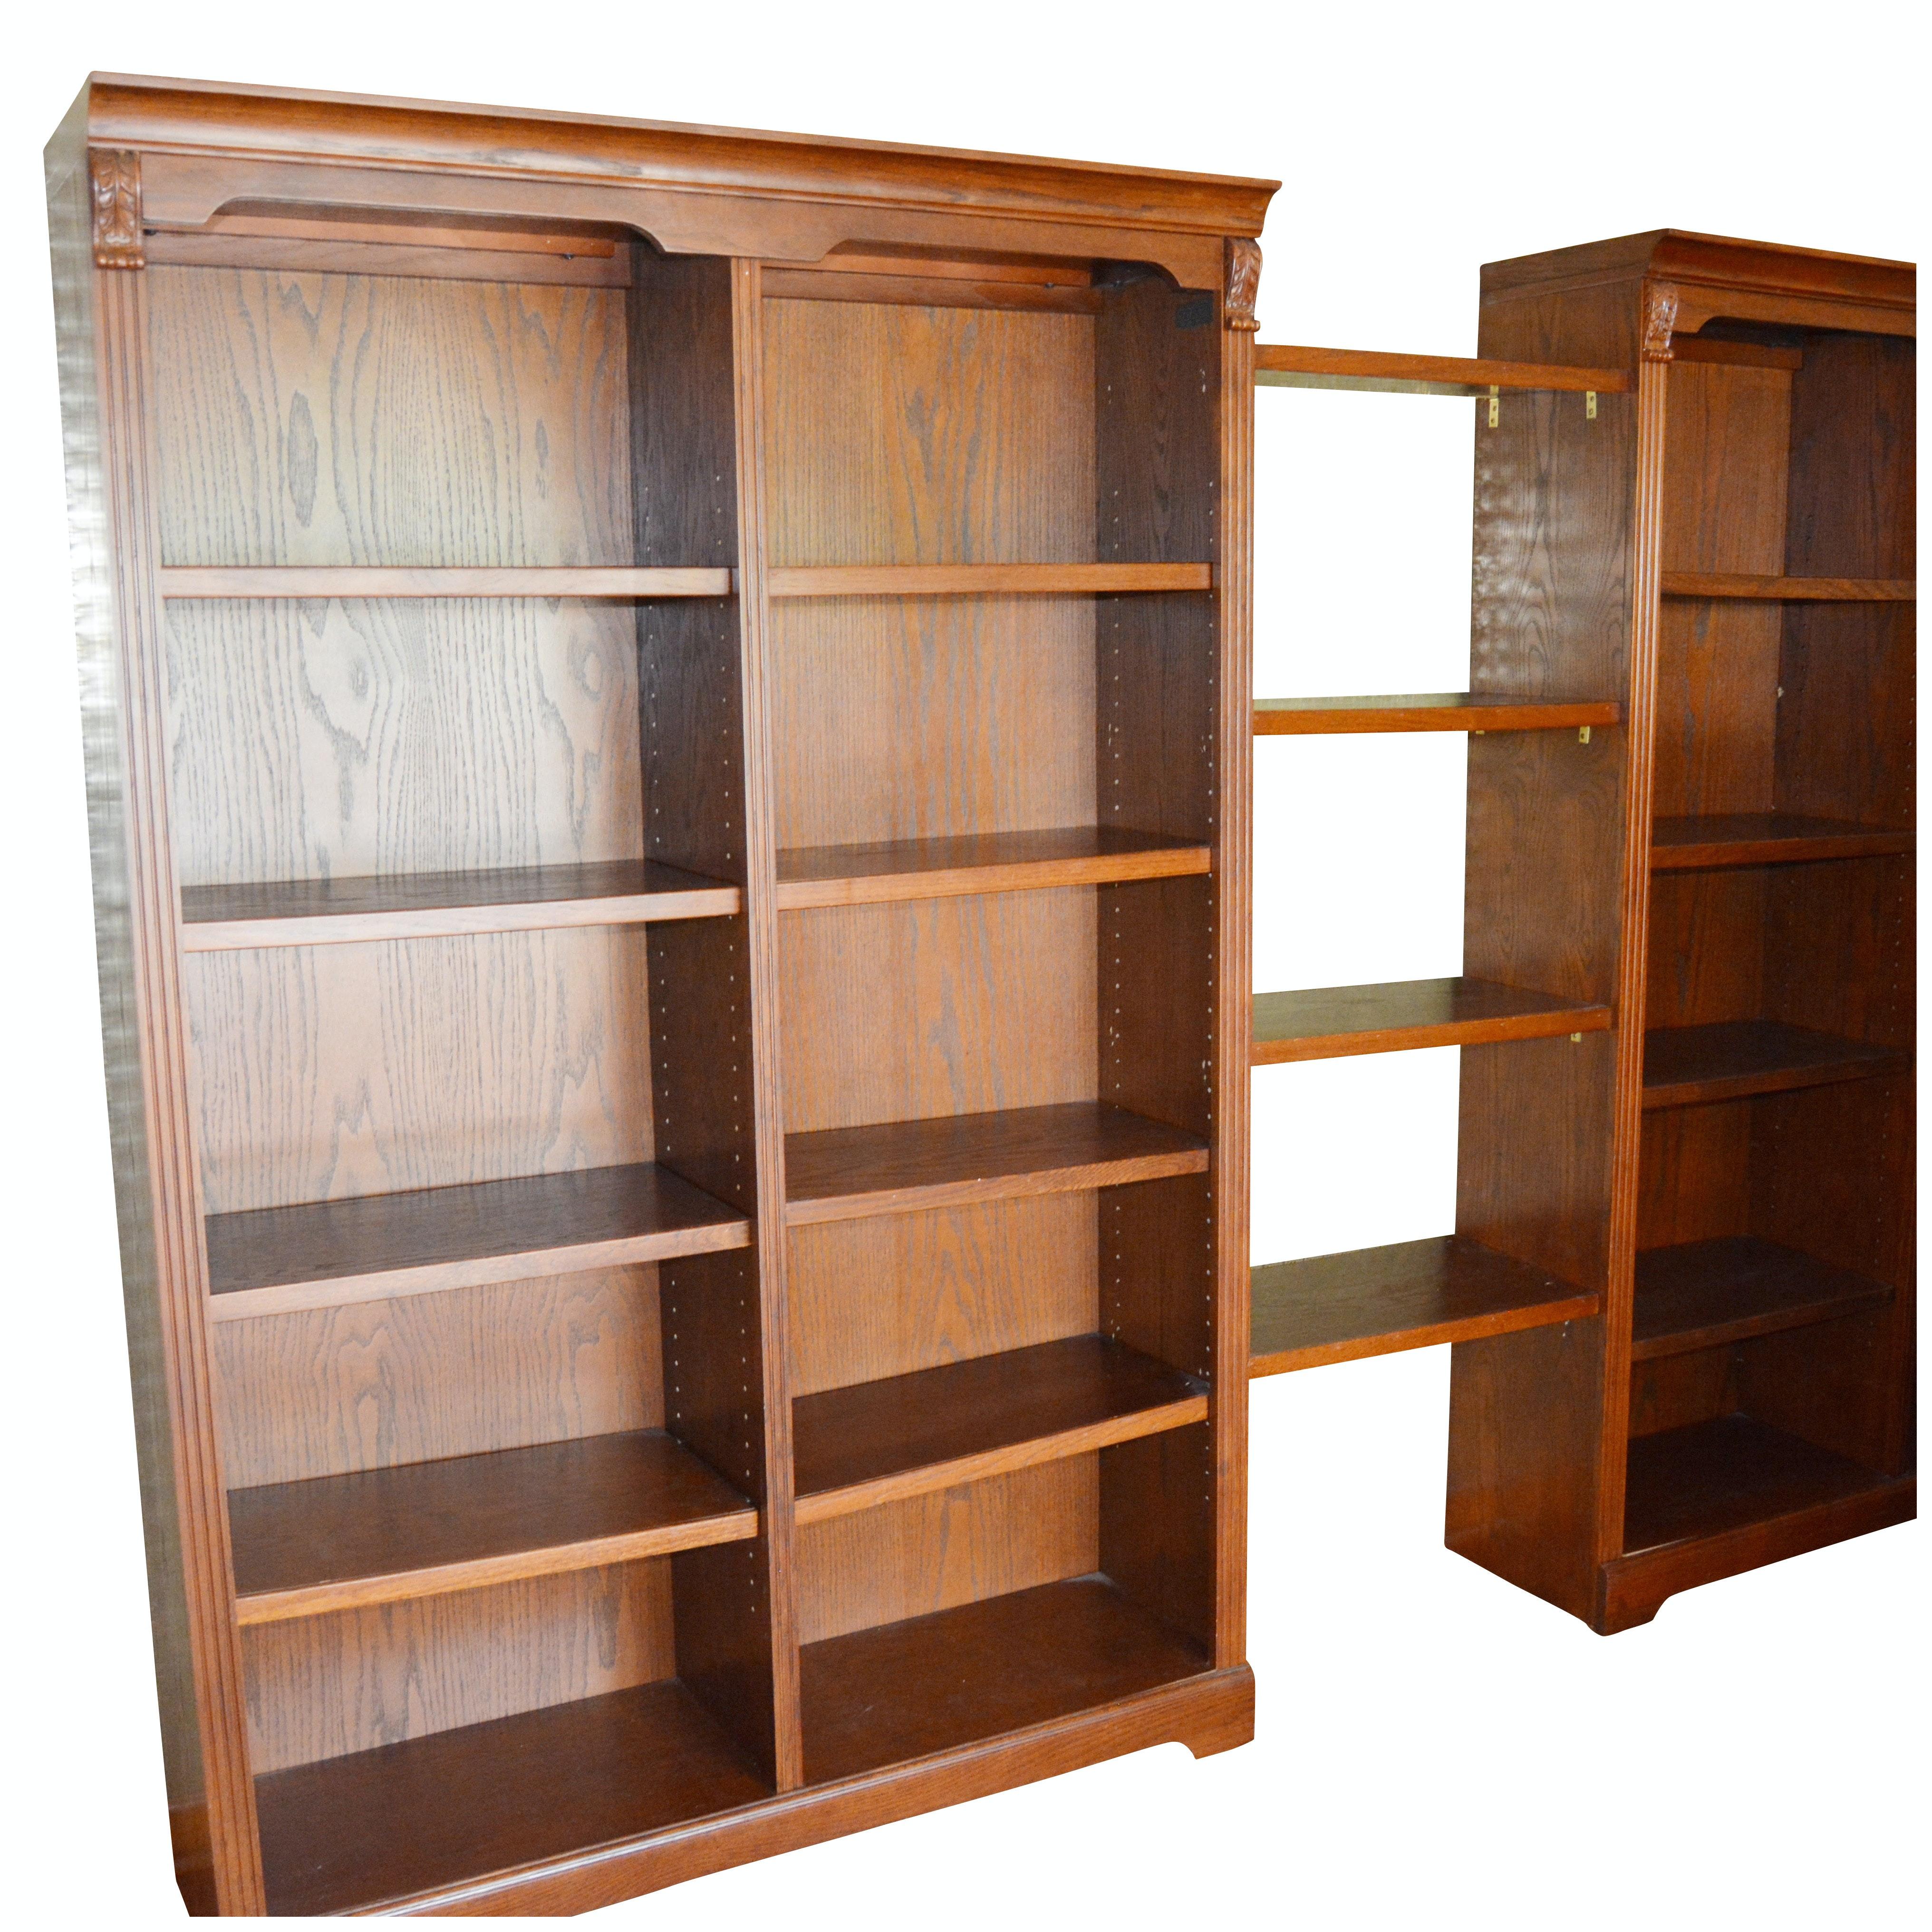 Whalen Oak Sectional Book Shelf, Late 20th Century